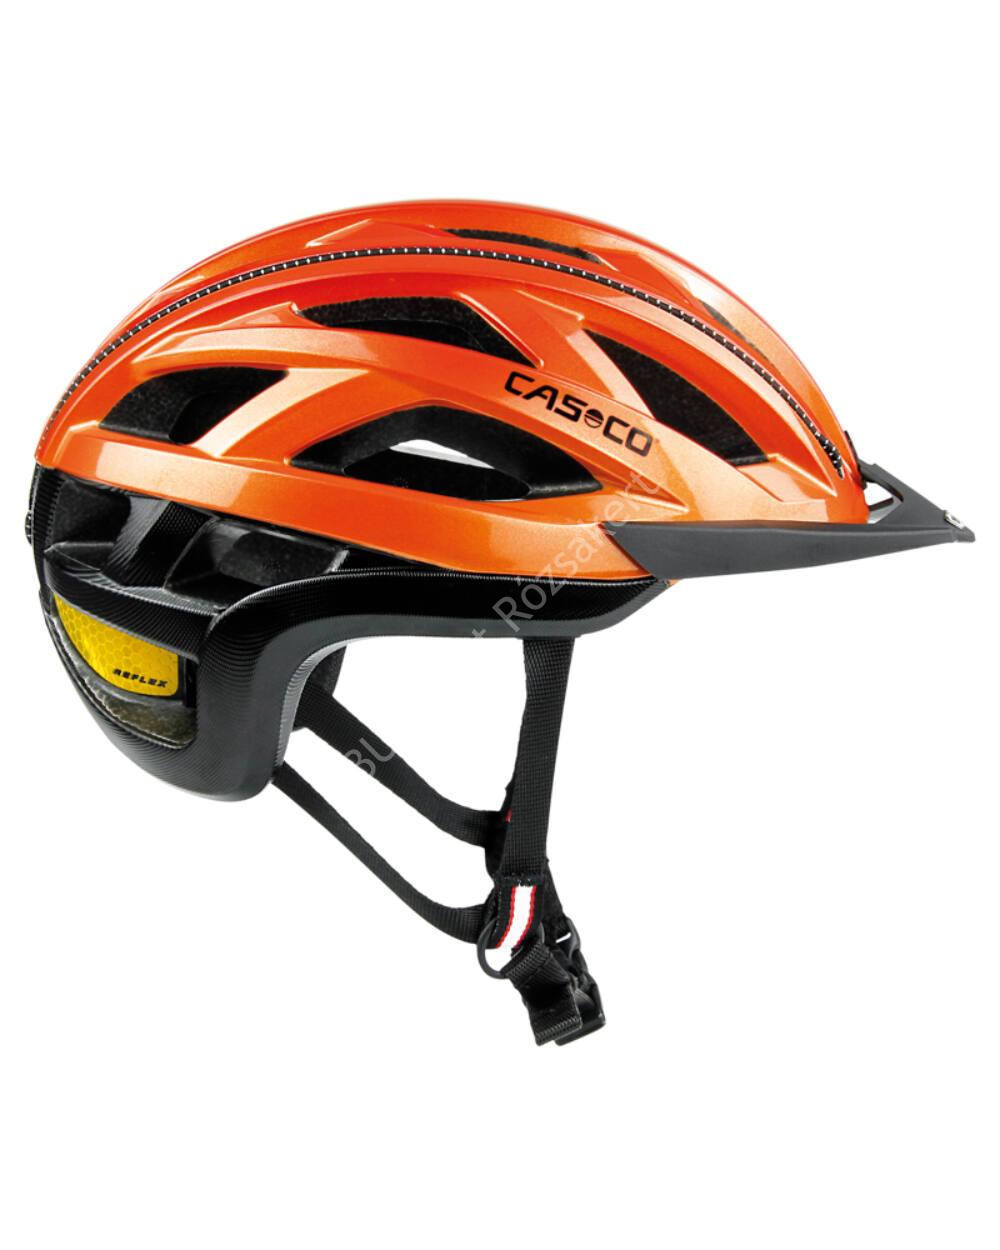 Casco Cuda 2 orange shiny bukósisak, 59-62 cm